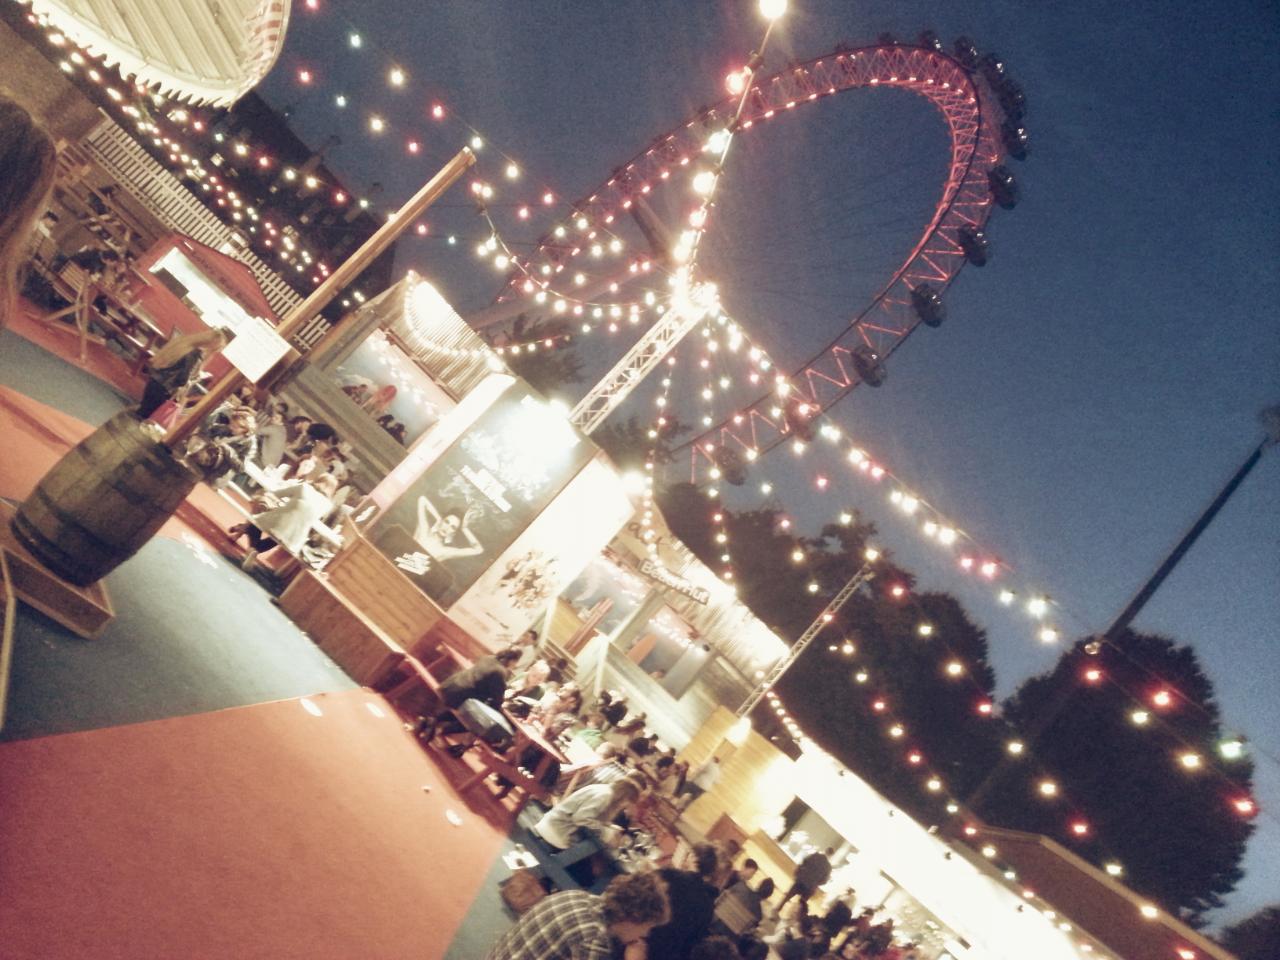 London eye from wonder ground